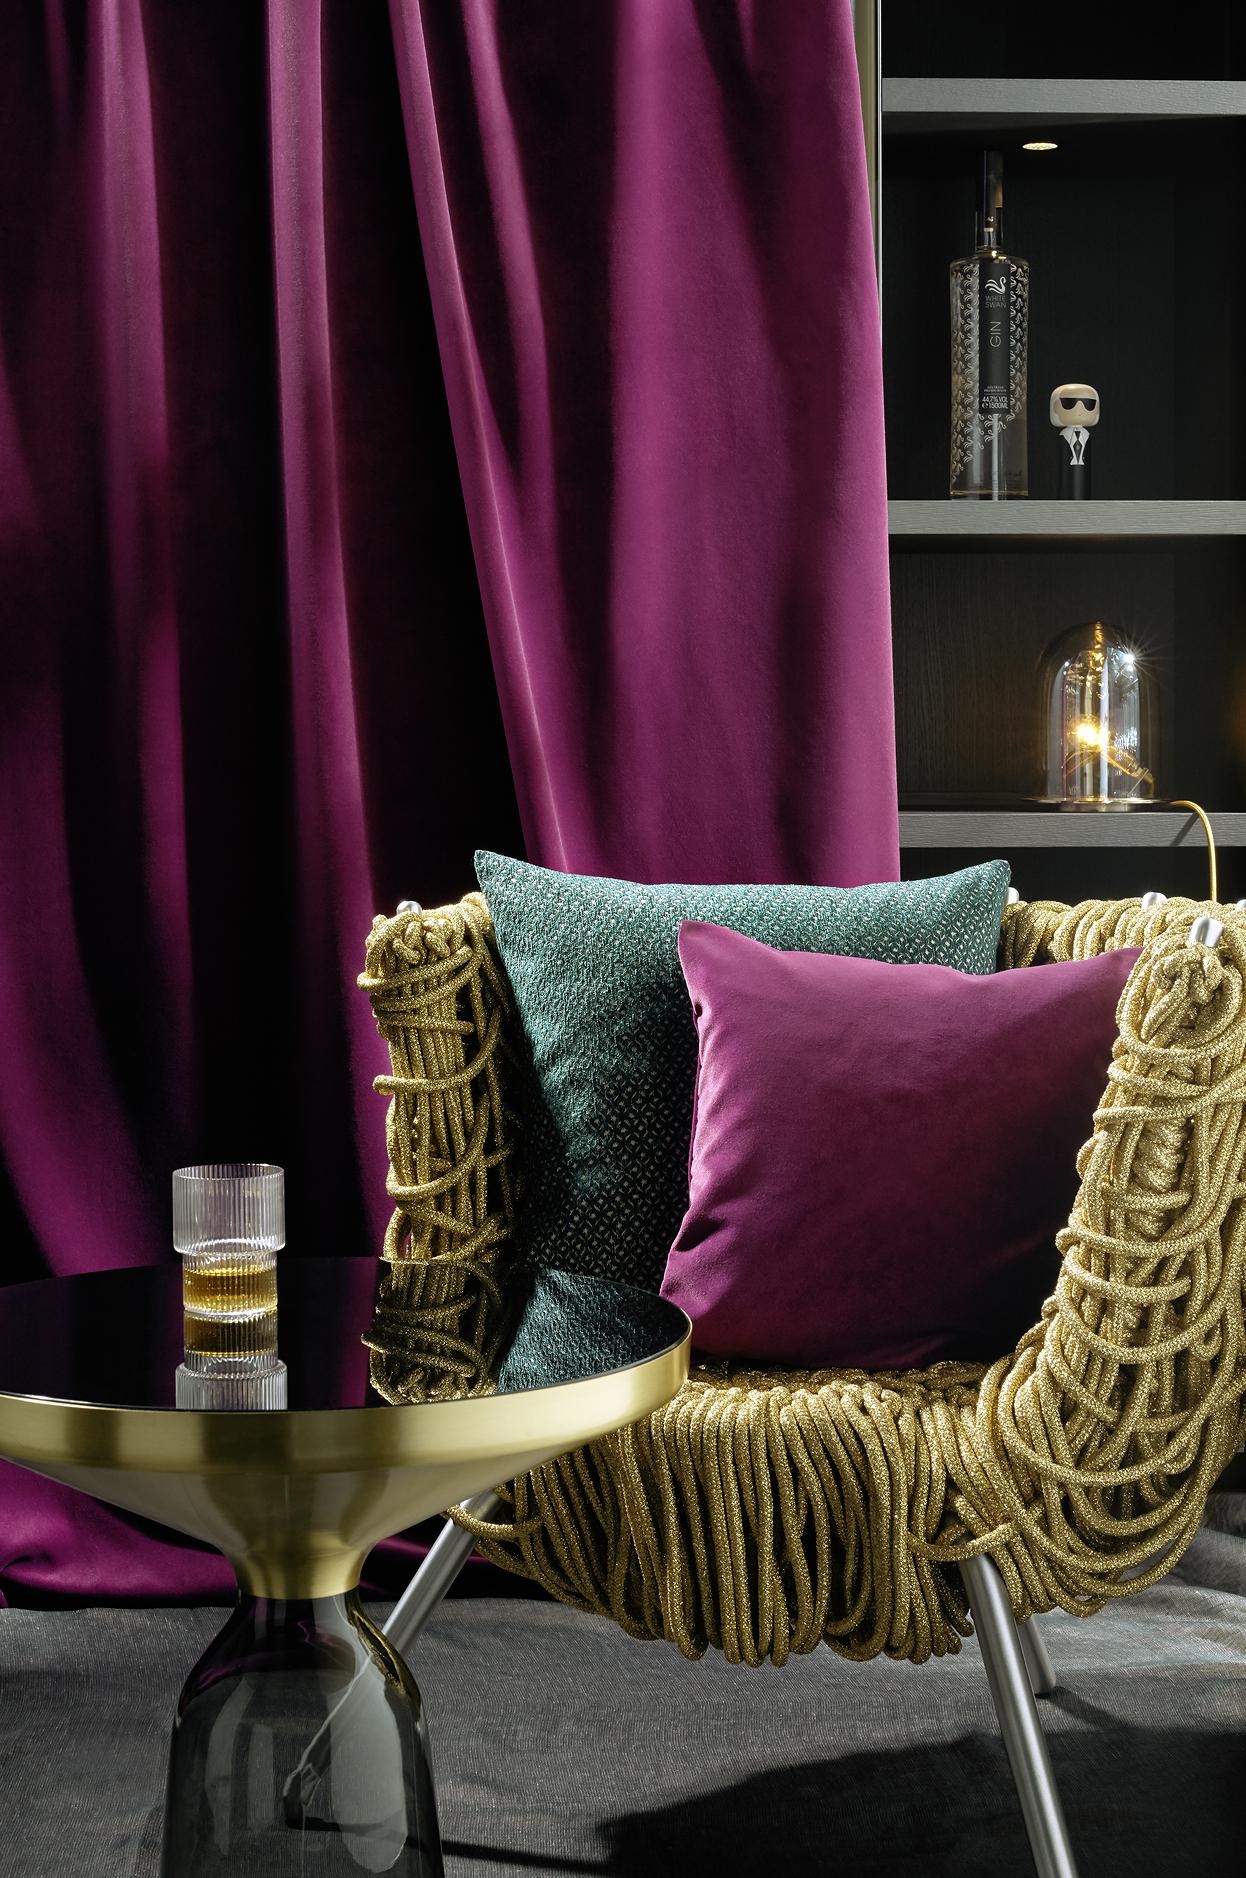 amazing einfache dekoration und mobel gib dir stoff 2 #1: #GibDirStoff, Saum-Viebahn, Elegance Velvety 2